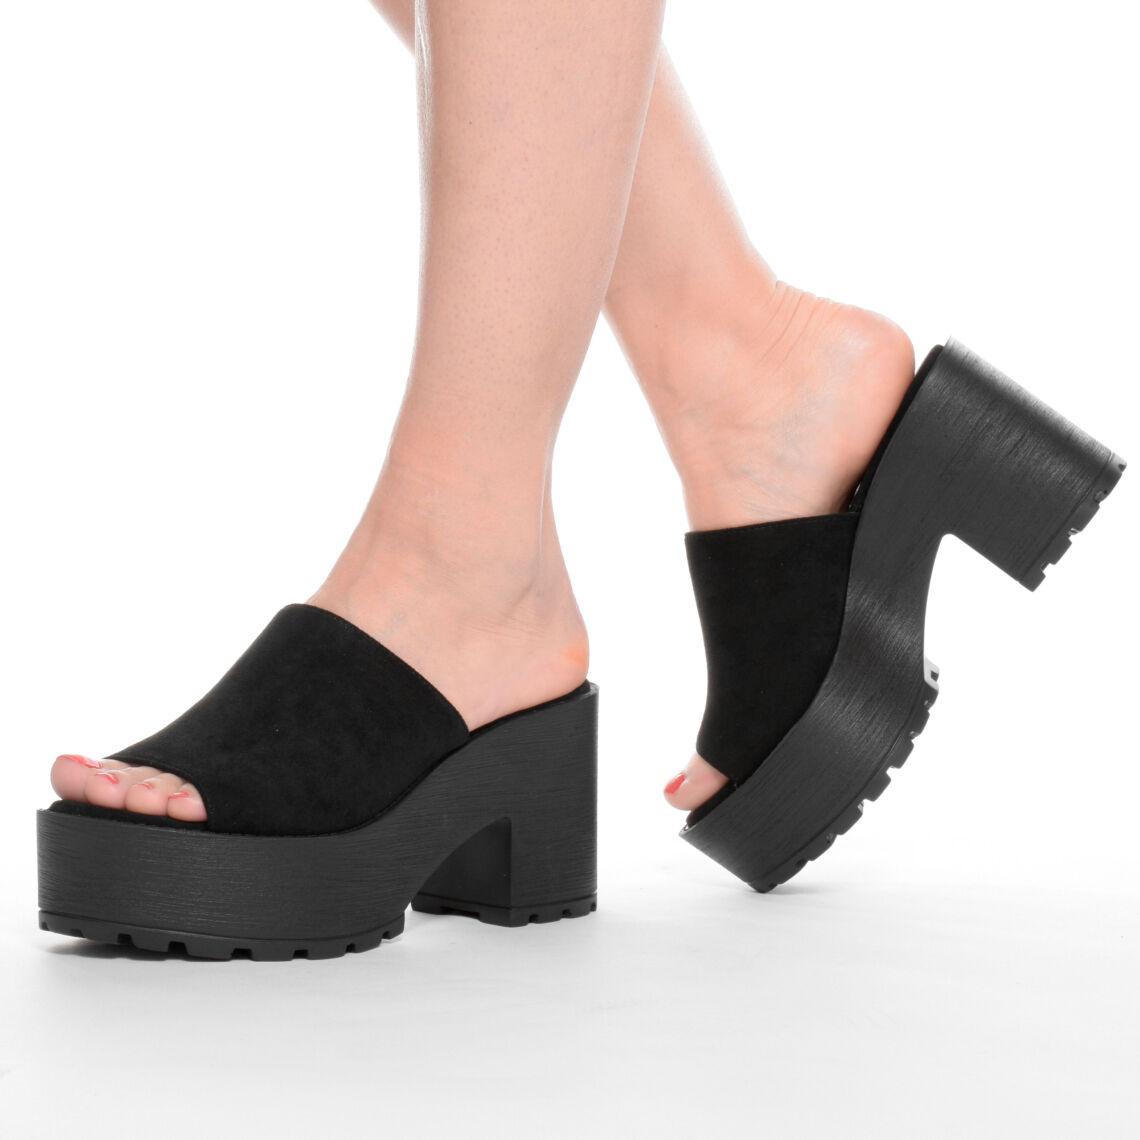 2343819de45b Női fekete magas talpú művelúr papucs - NŐI PAPUCS - Női cipő ...